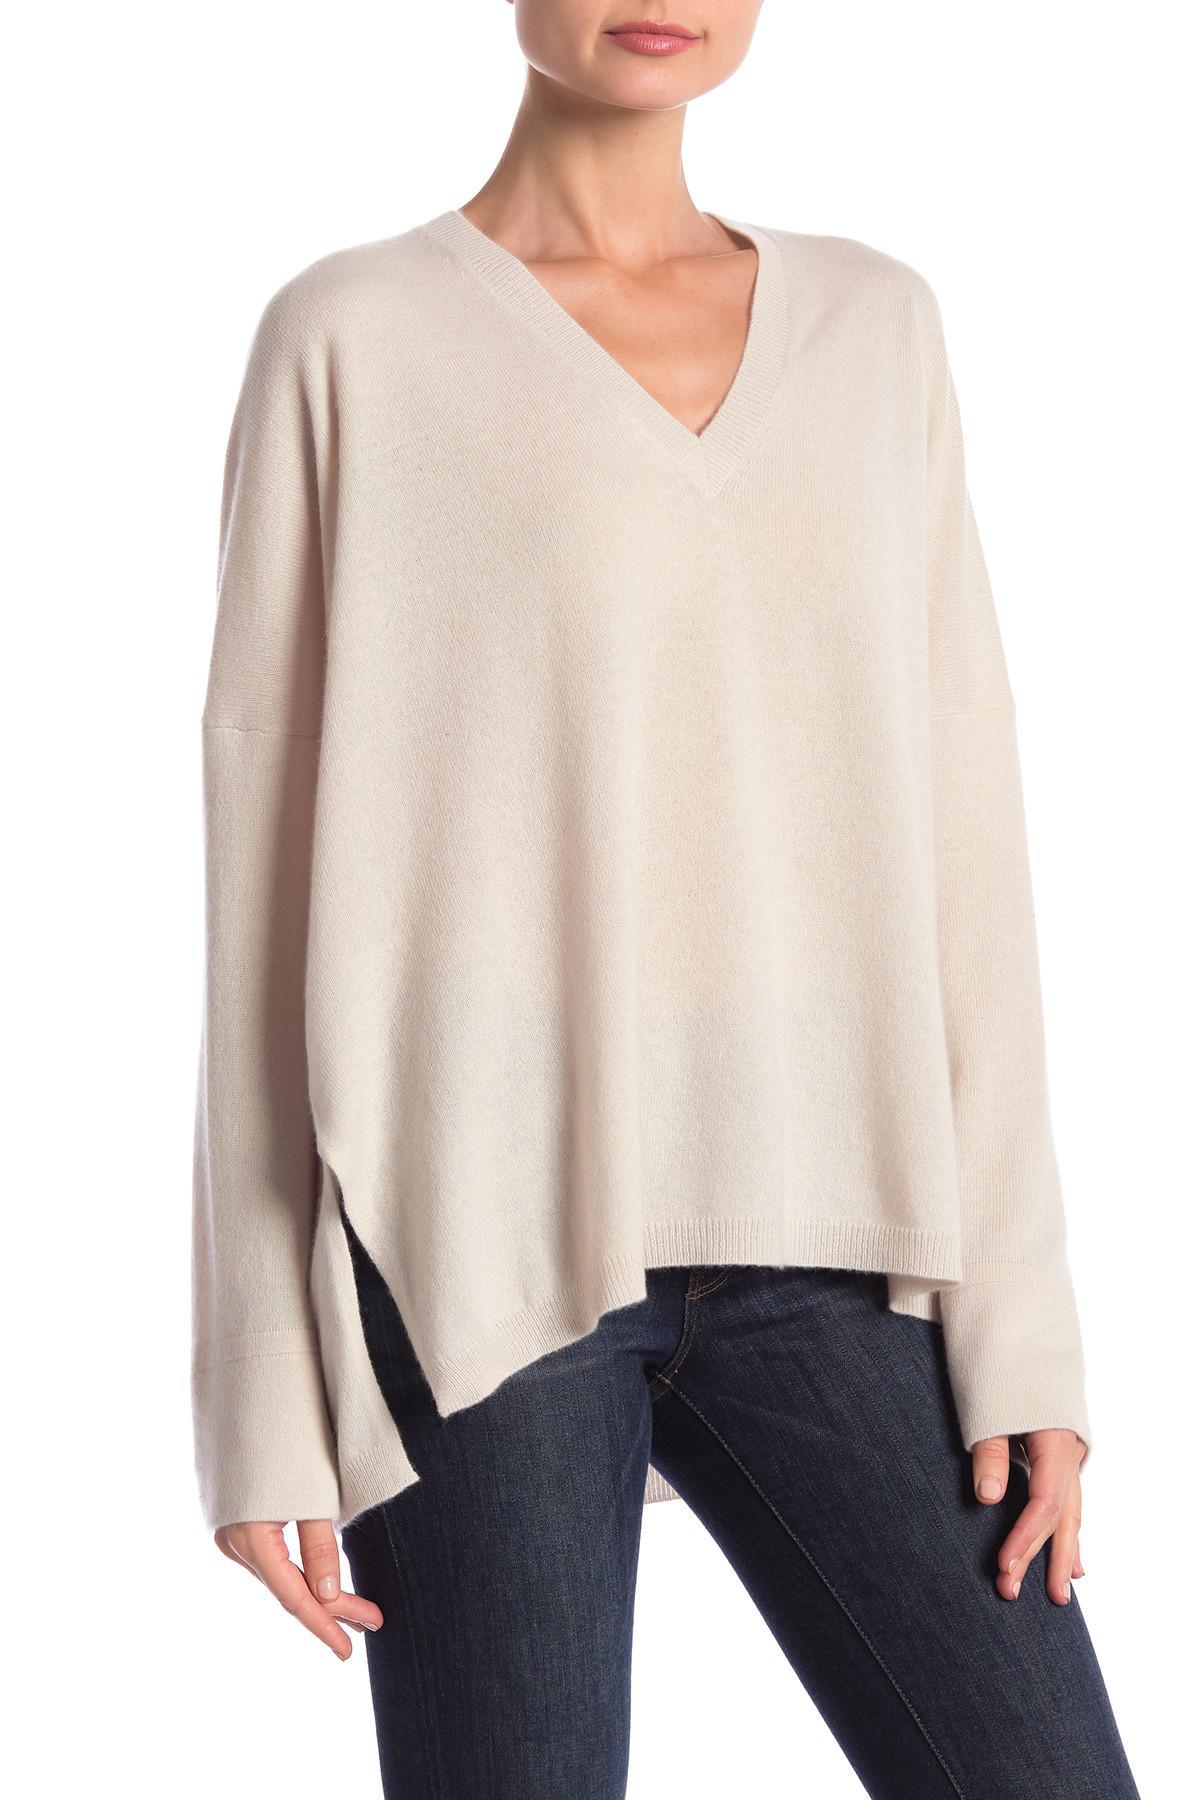 e087382ebd0 360cashmere Olivia V-neck Cashmere Sweater in Natural - Lyst